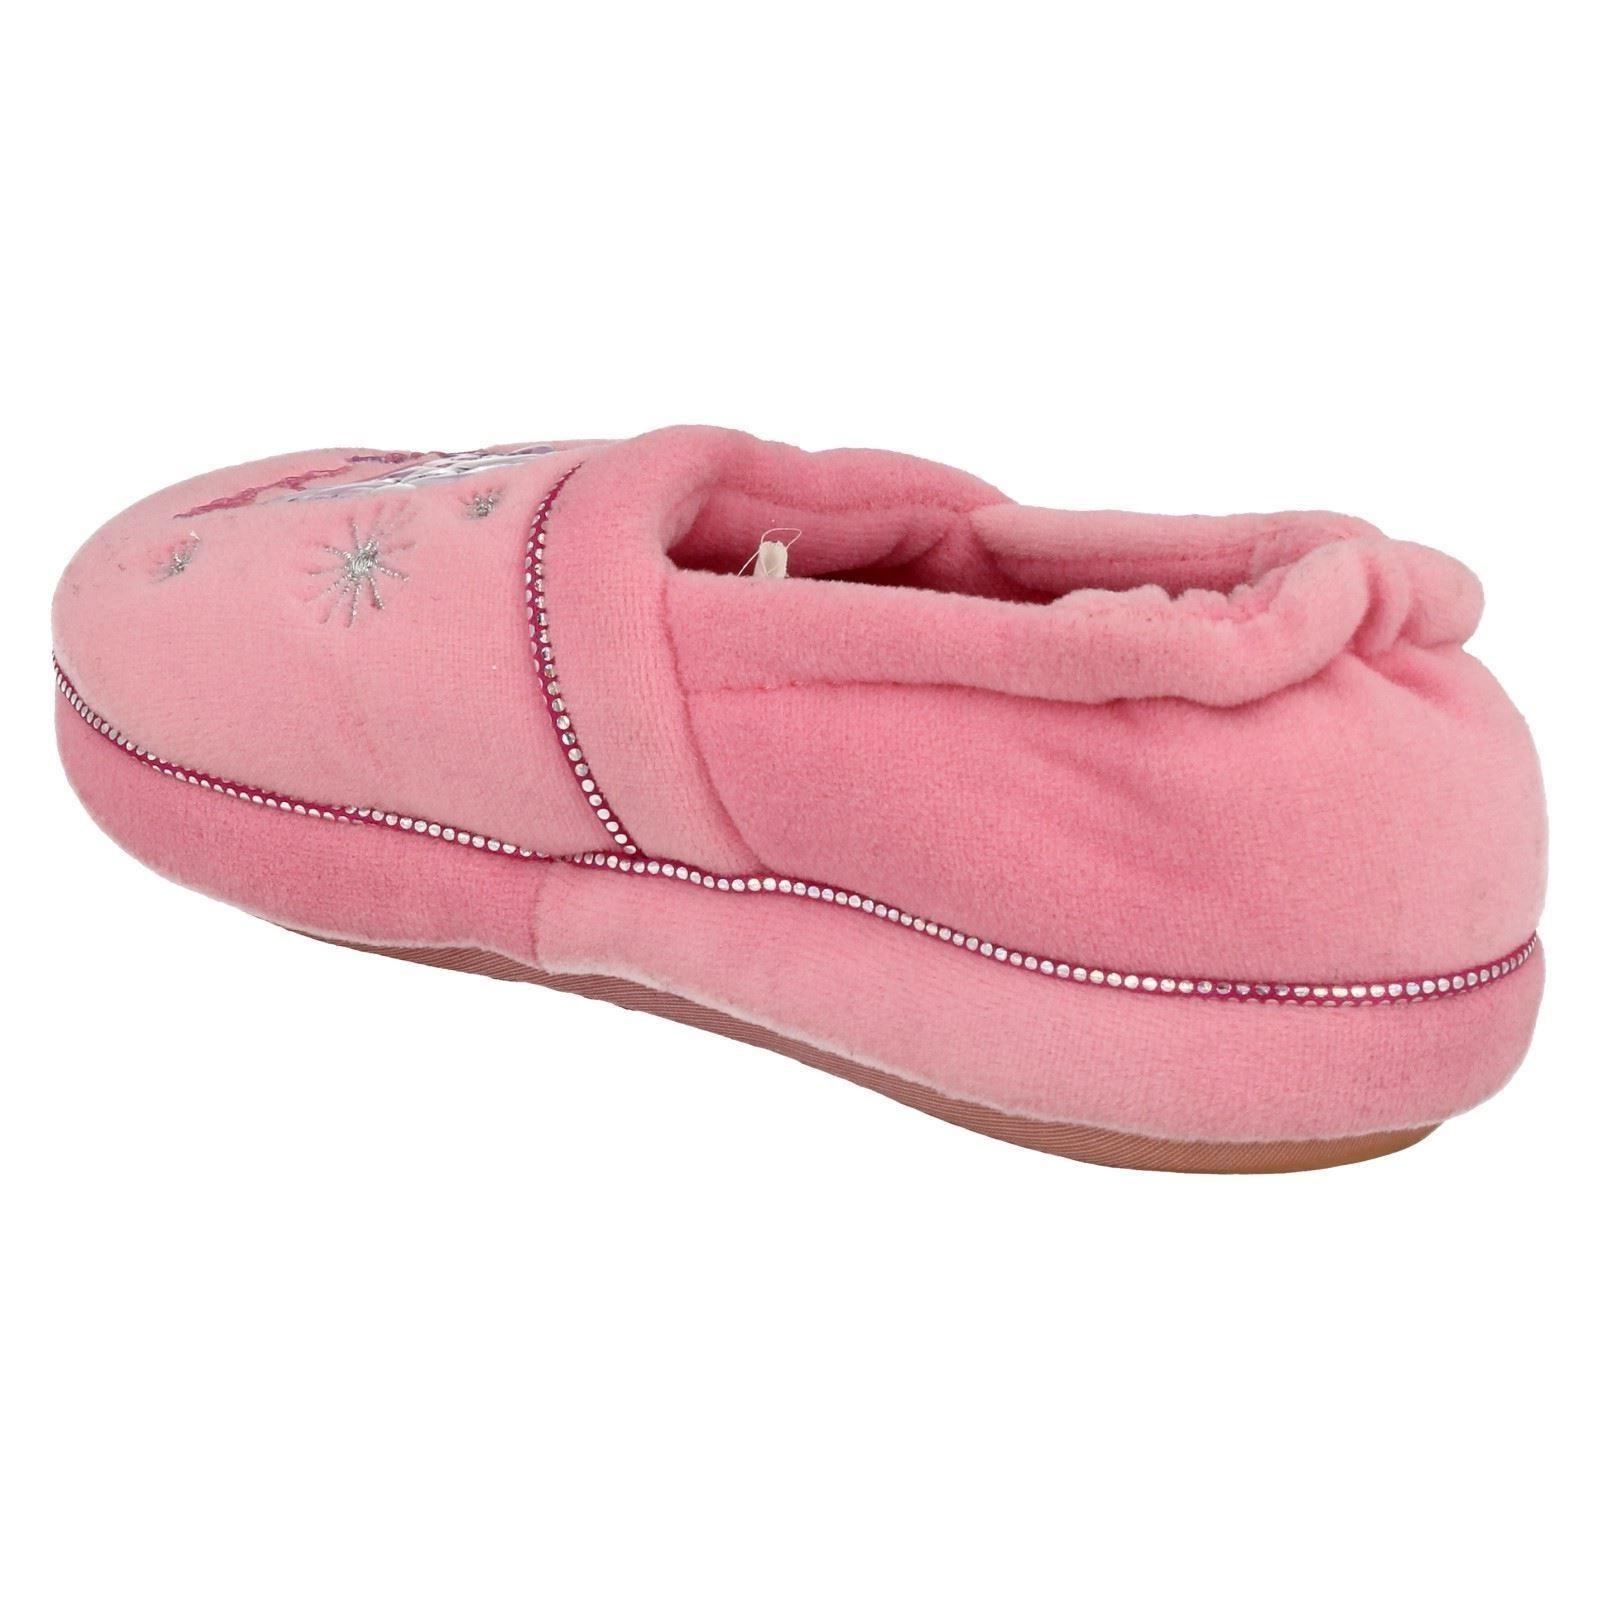 Chicas Novalty Textil Zapatillas Tinker Bell 'Etiqueta ~ K